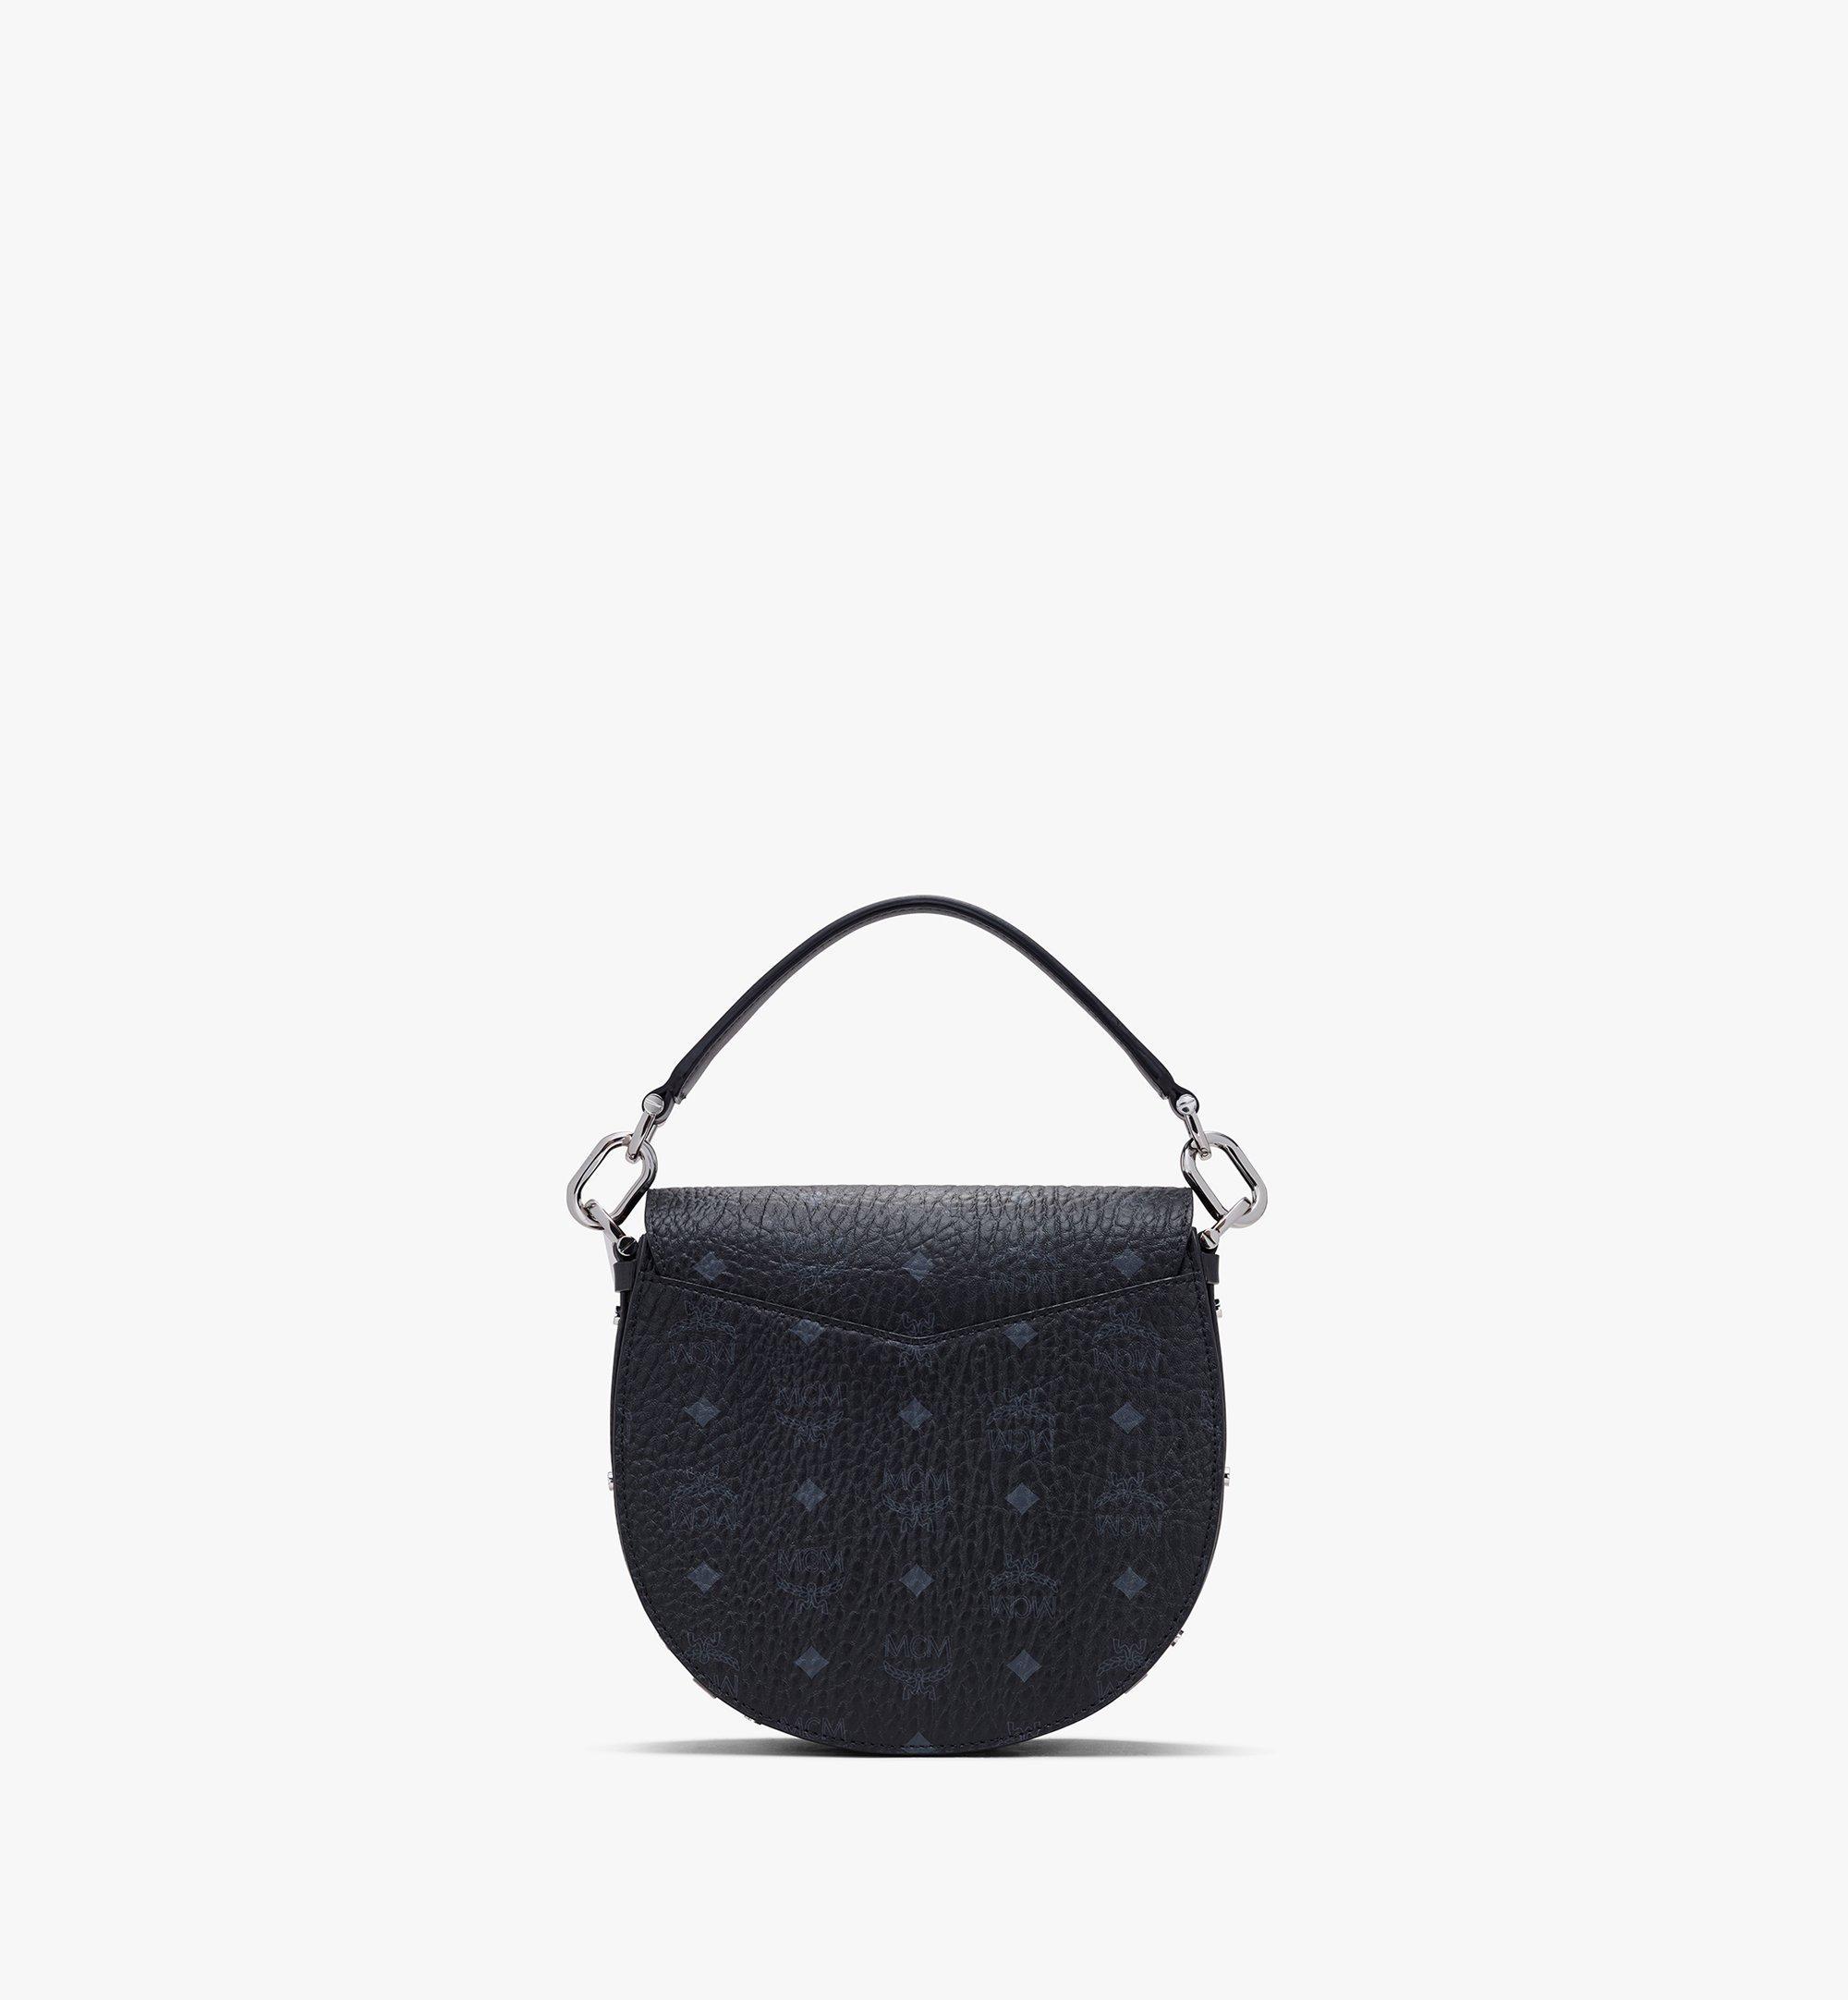 MCM Patricia Shoulder Bag in Visetos Black MWSASPA07BK001 Alternate View 2